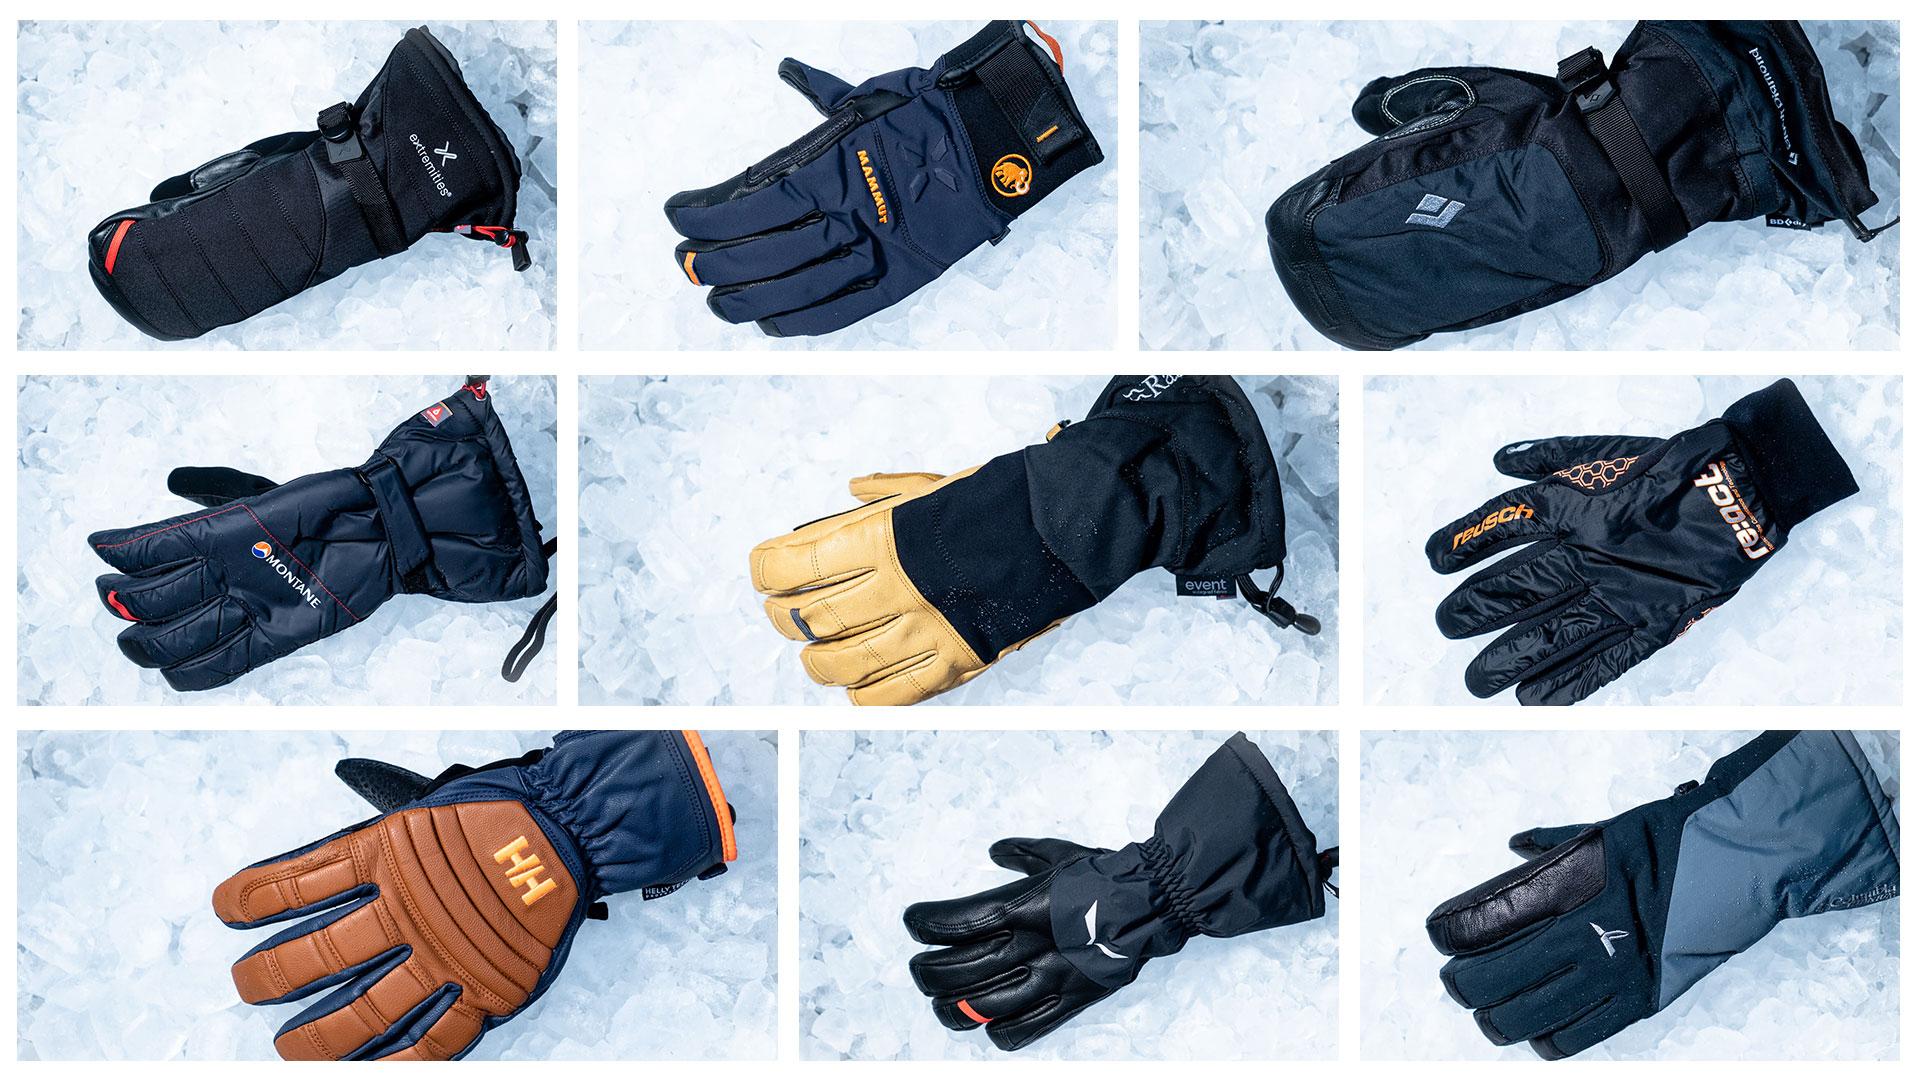 BLACK LARGE Extremities warm winter glove waterproof xdry windproof breathable